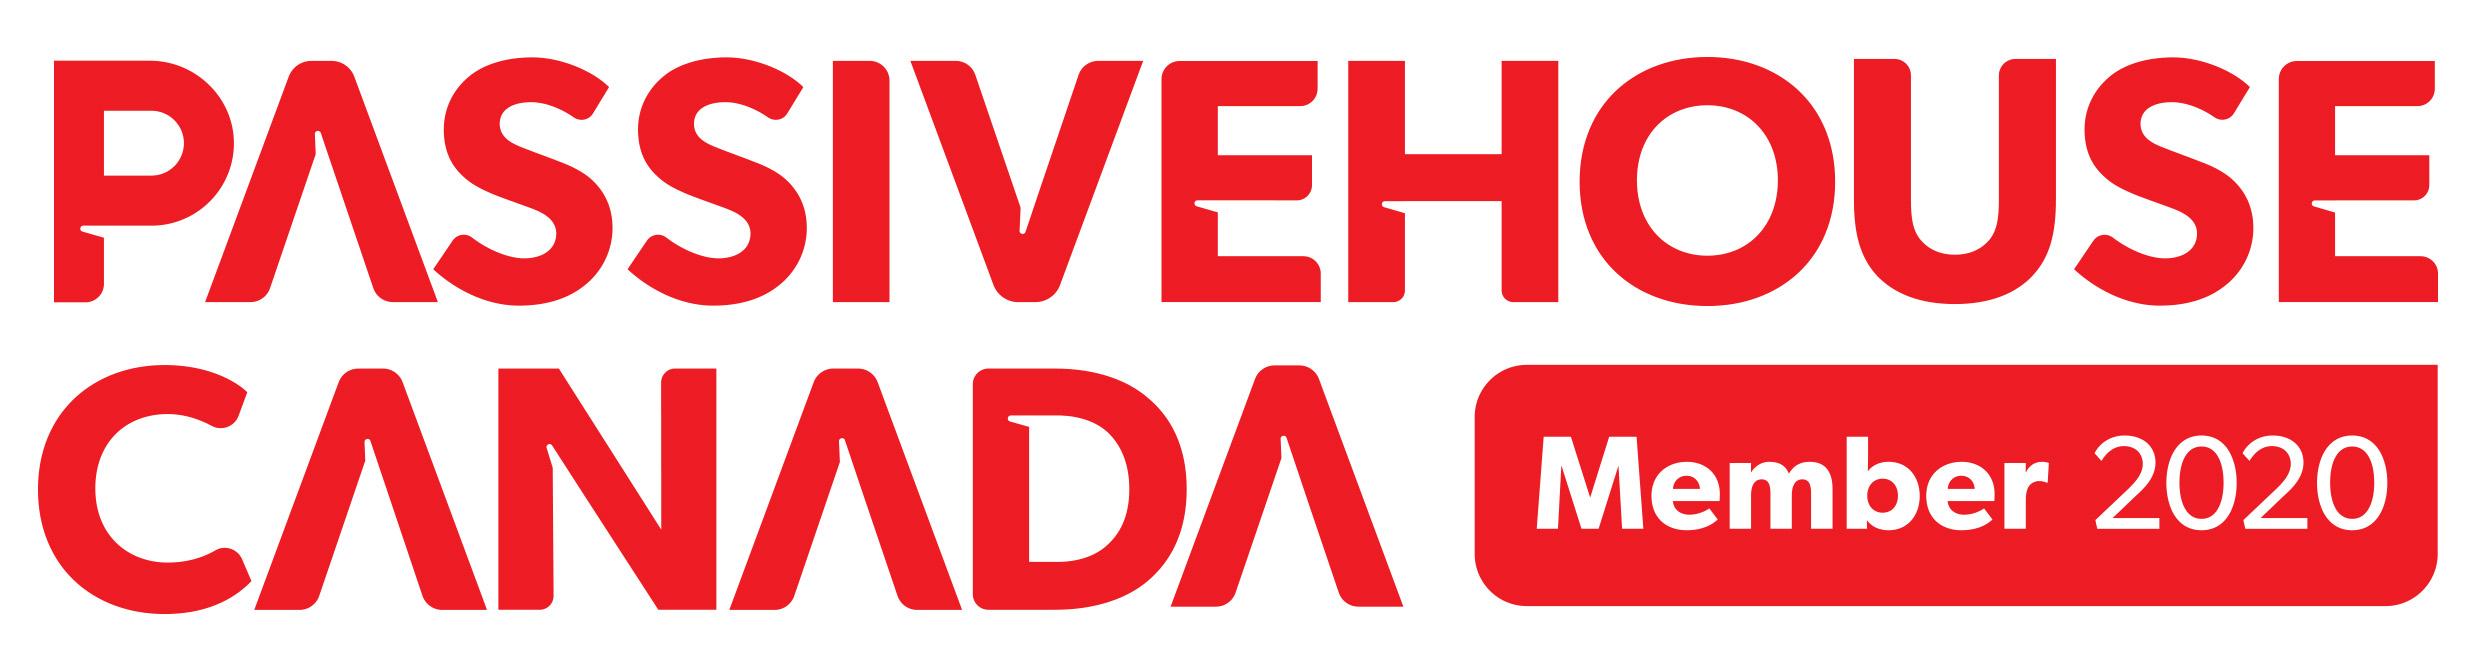 Viewmax logo Passive House Canada